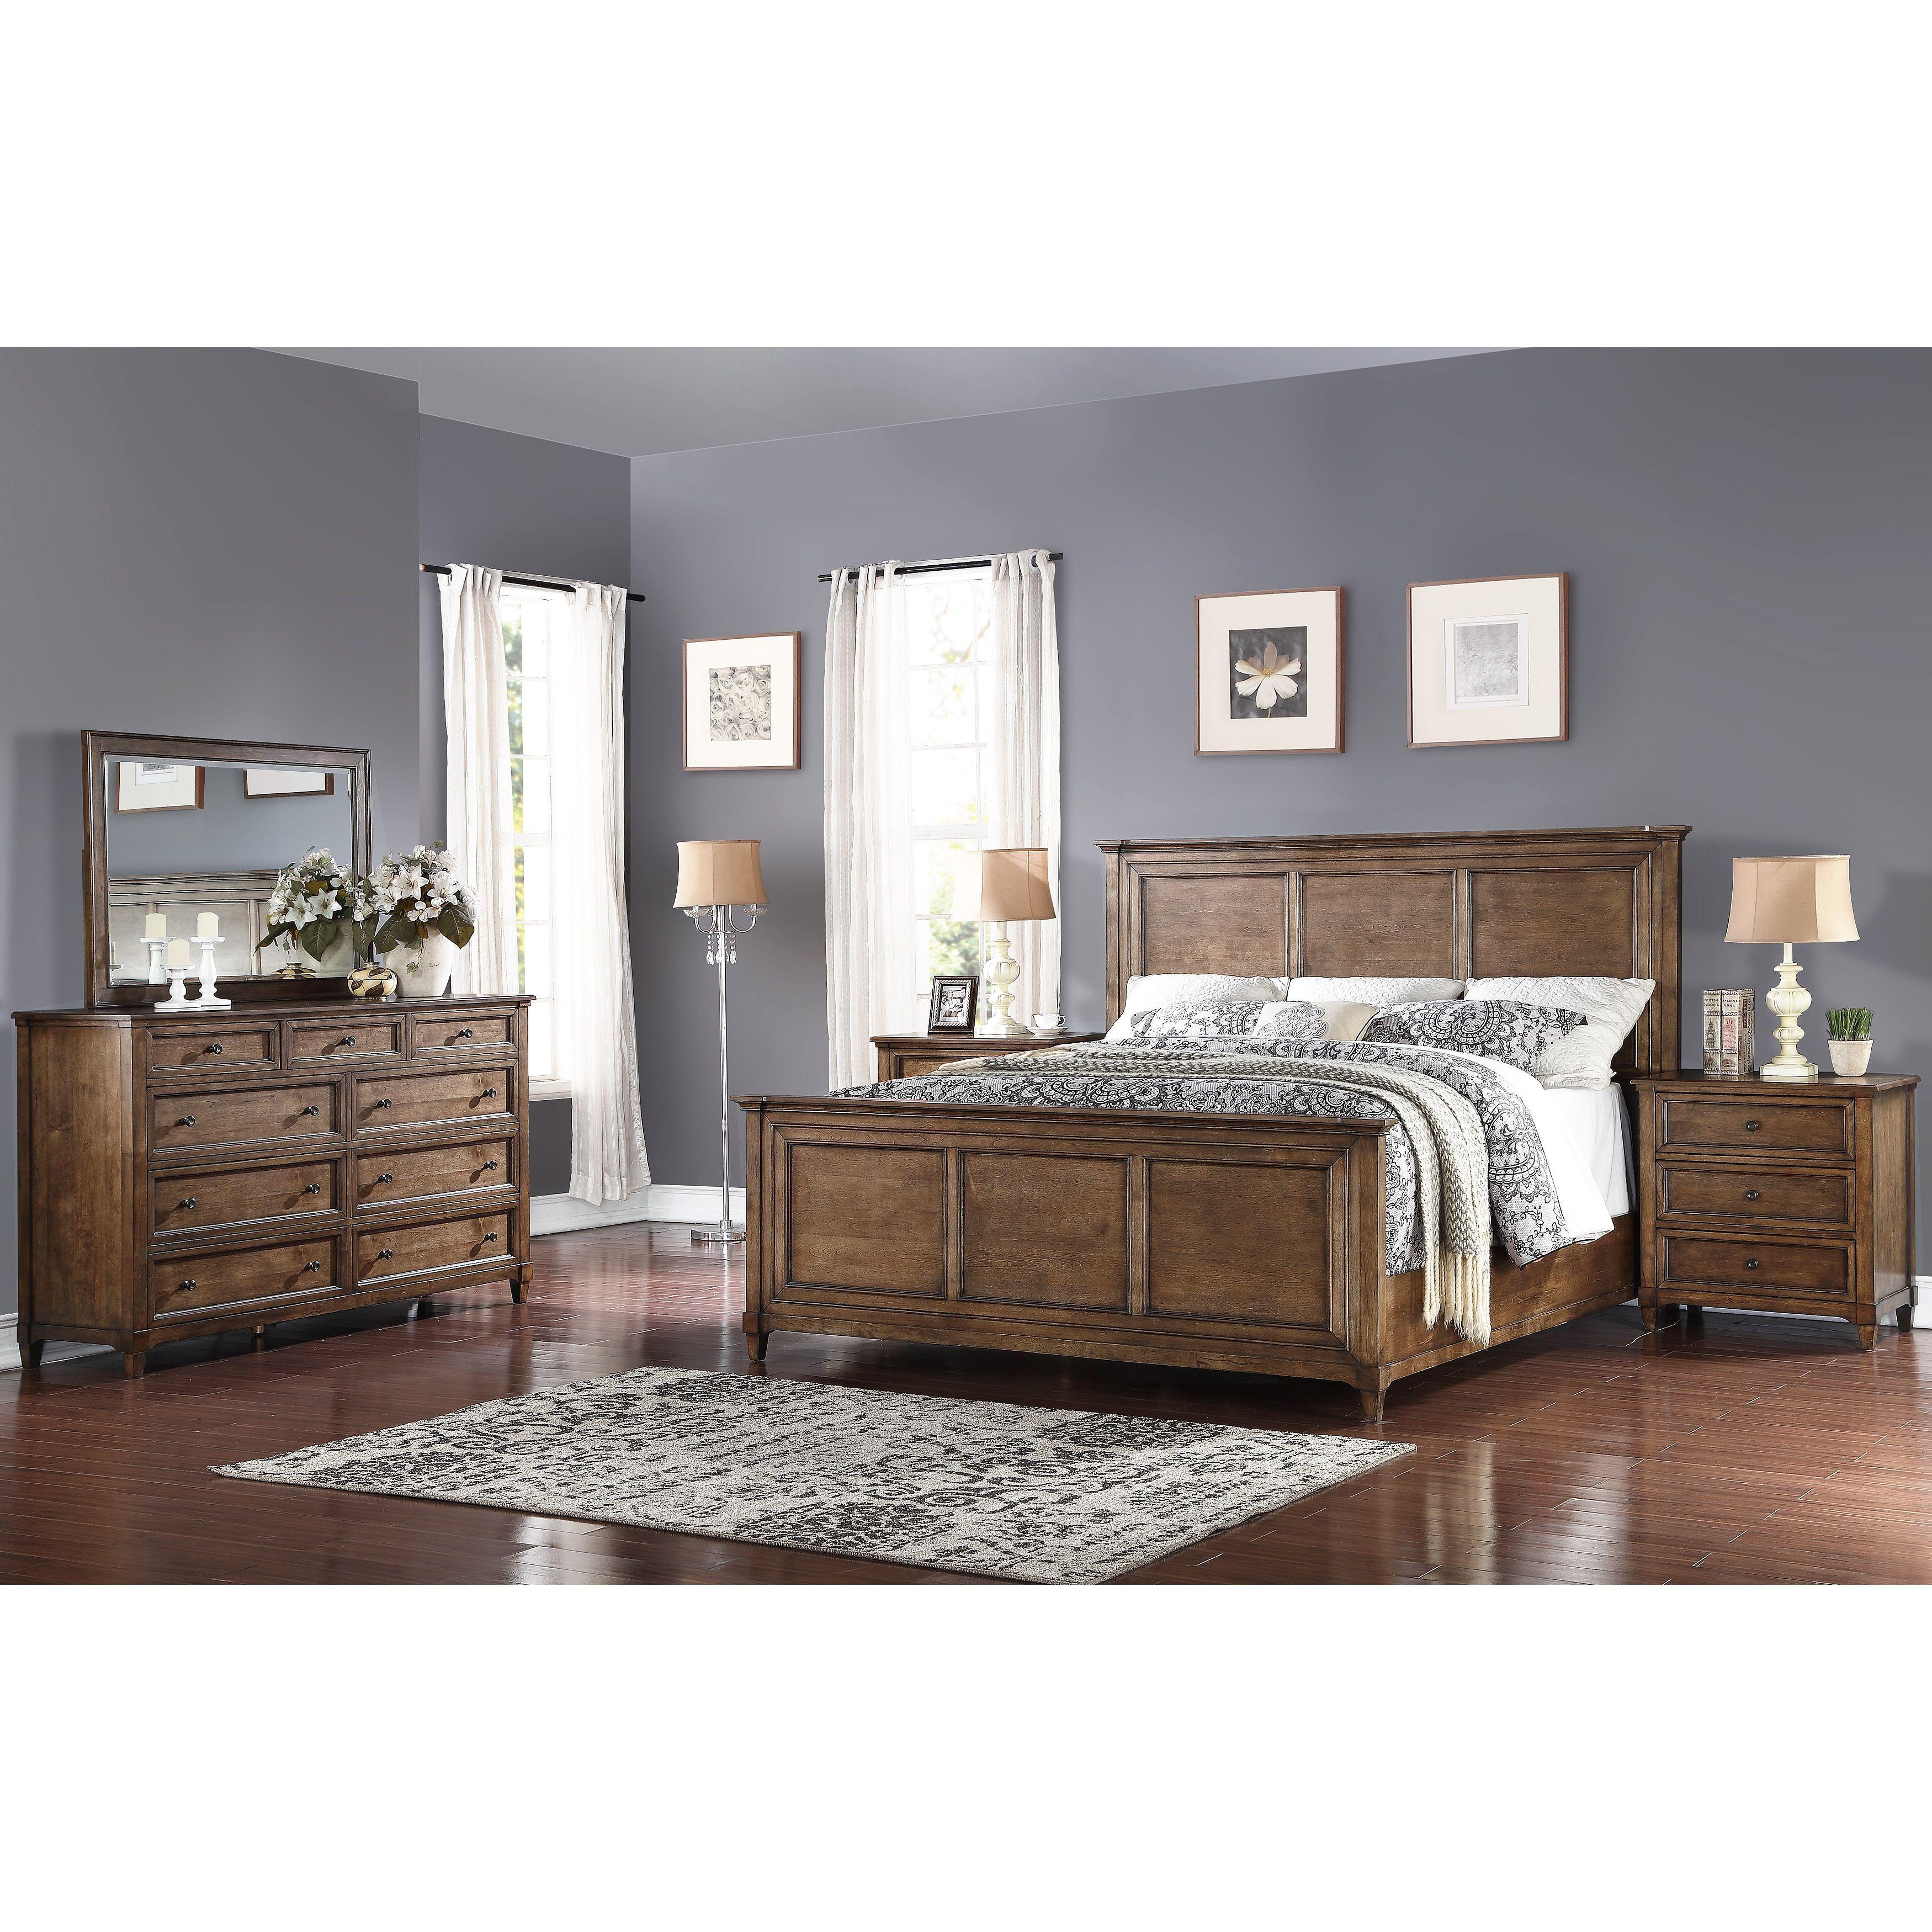 Luxury Weathered Bedroom Furniture